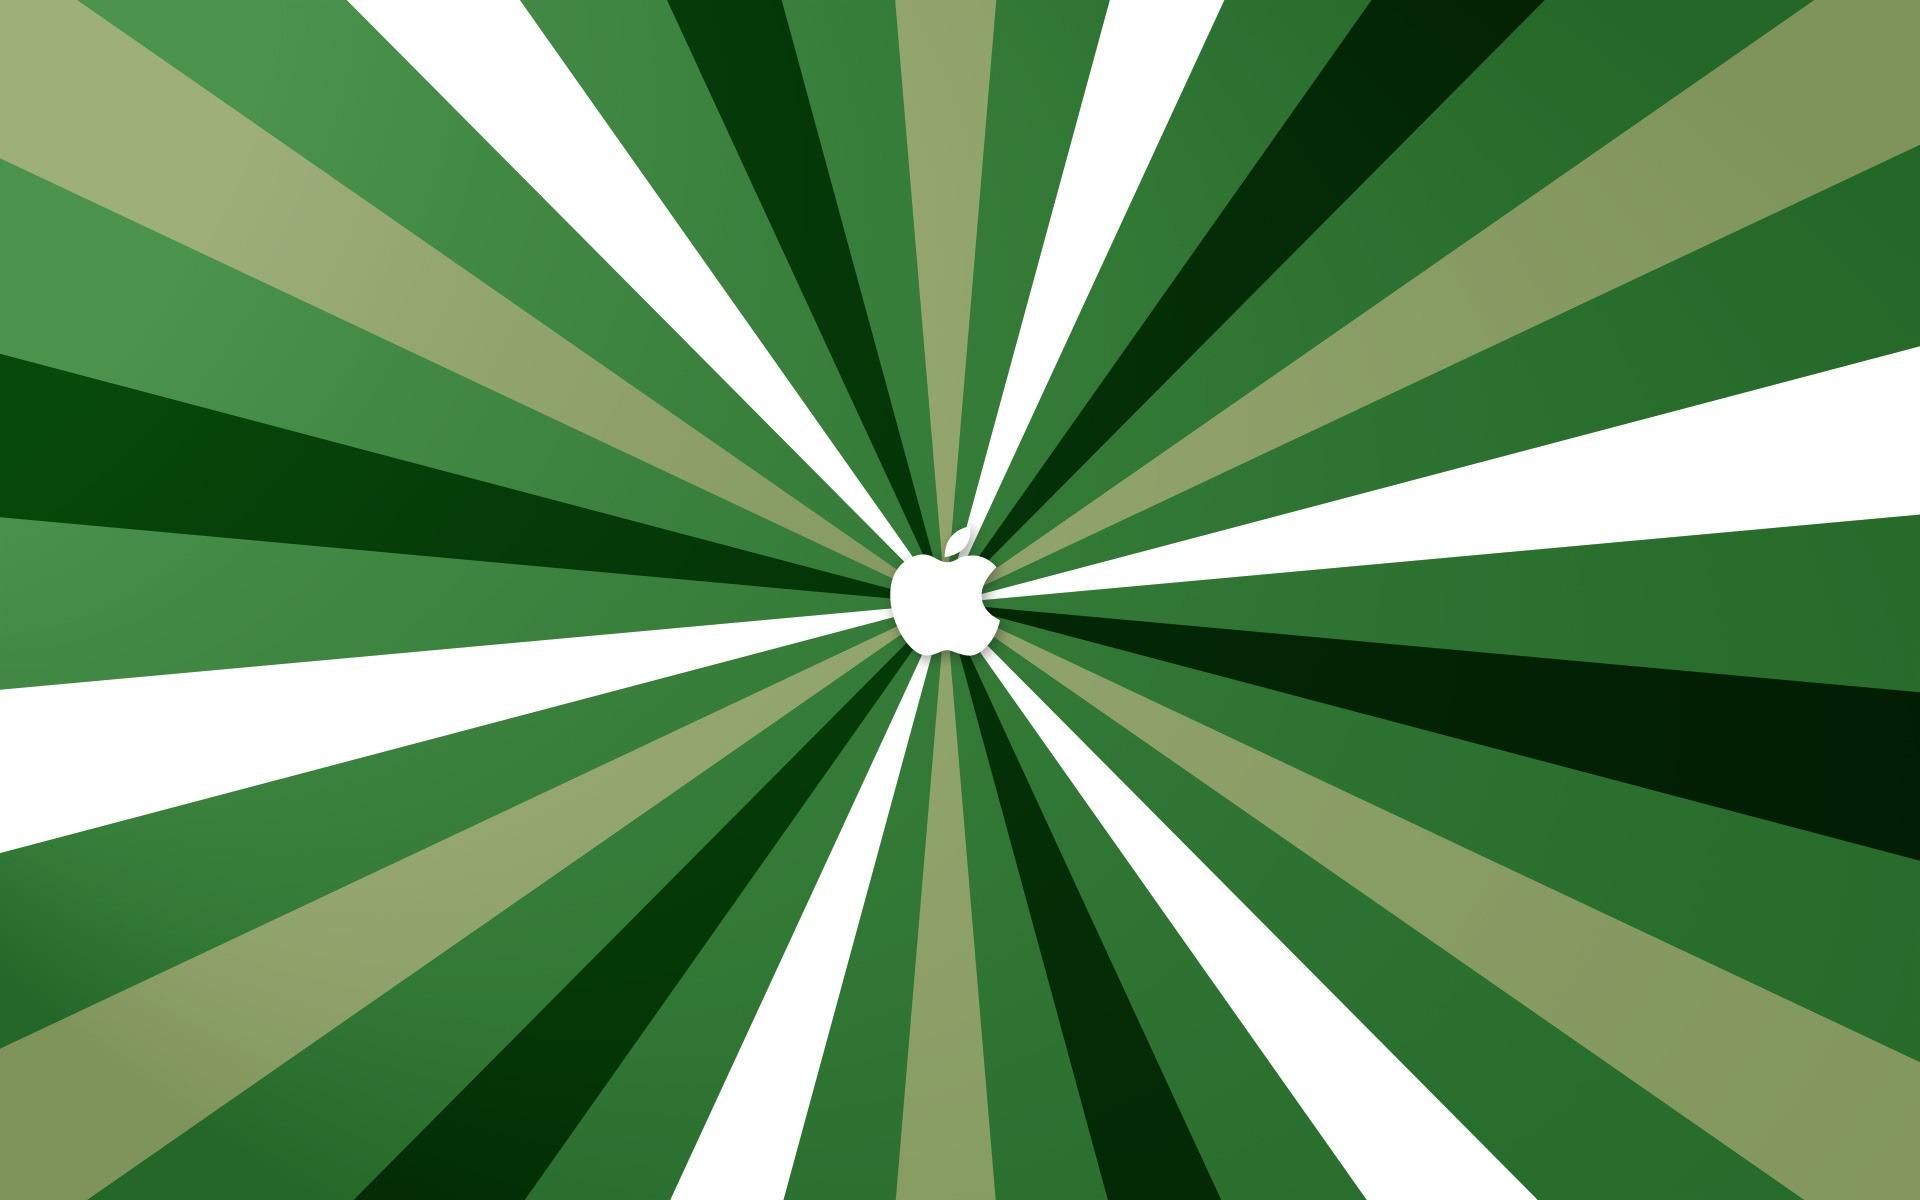 Green Stripes Apple HD